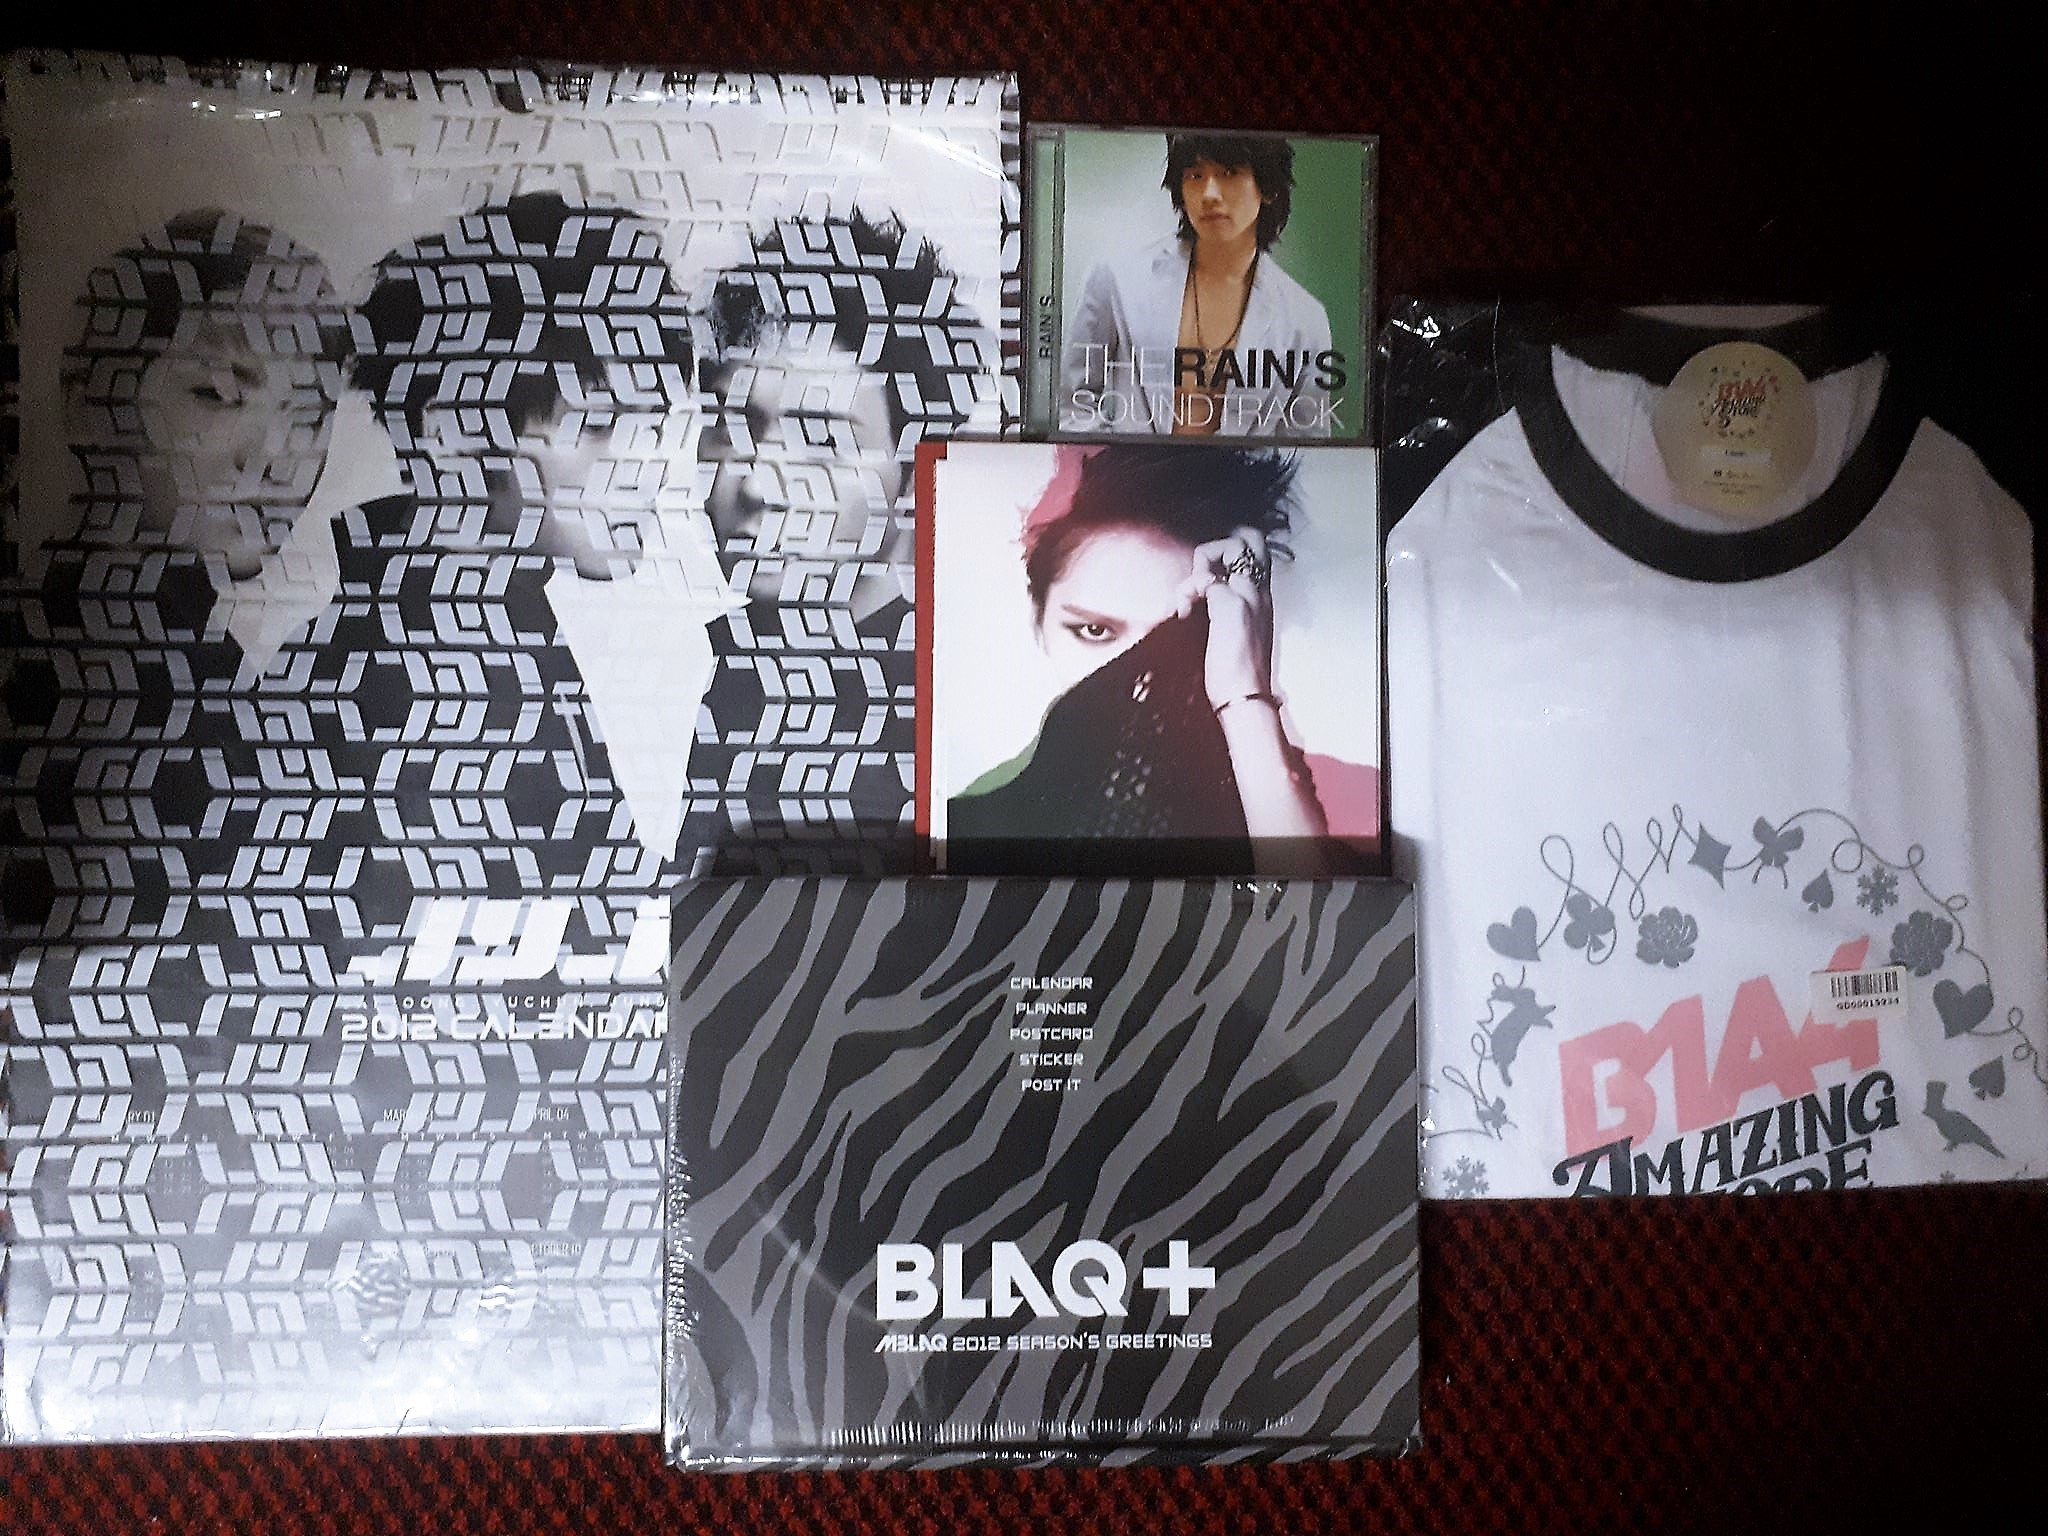 JYJ,  Jaejoong, Rain, Mblaq, B1A4 (Calendar. Albums, T-shirt)